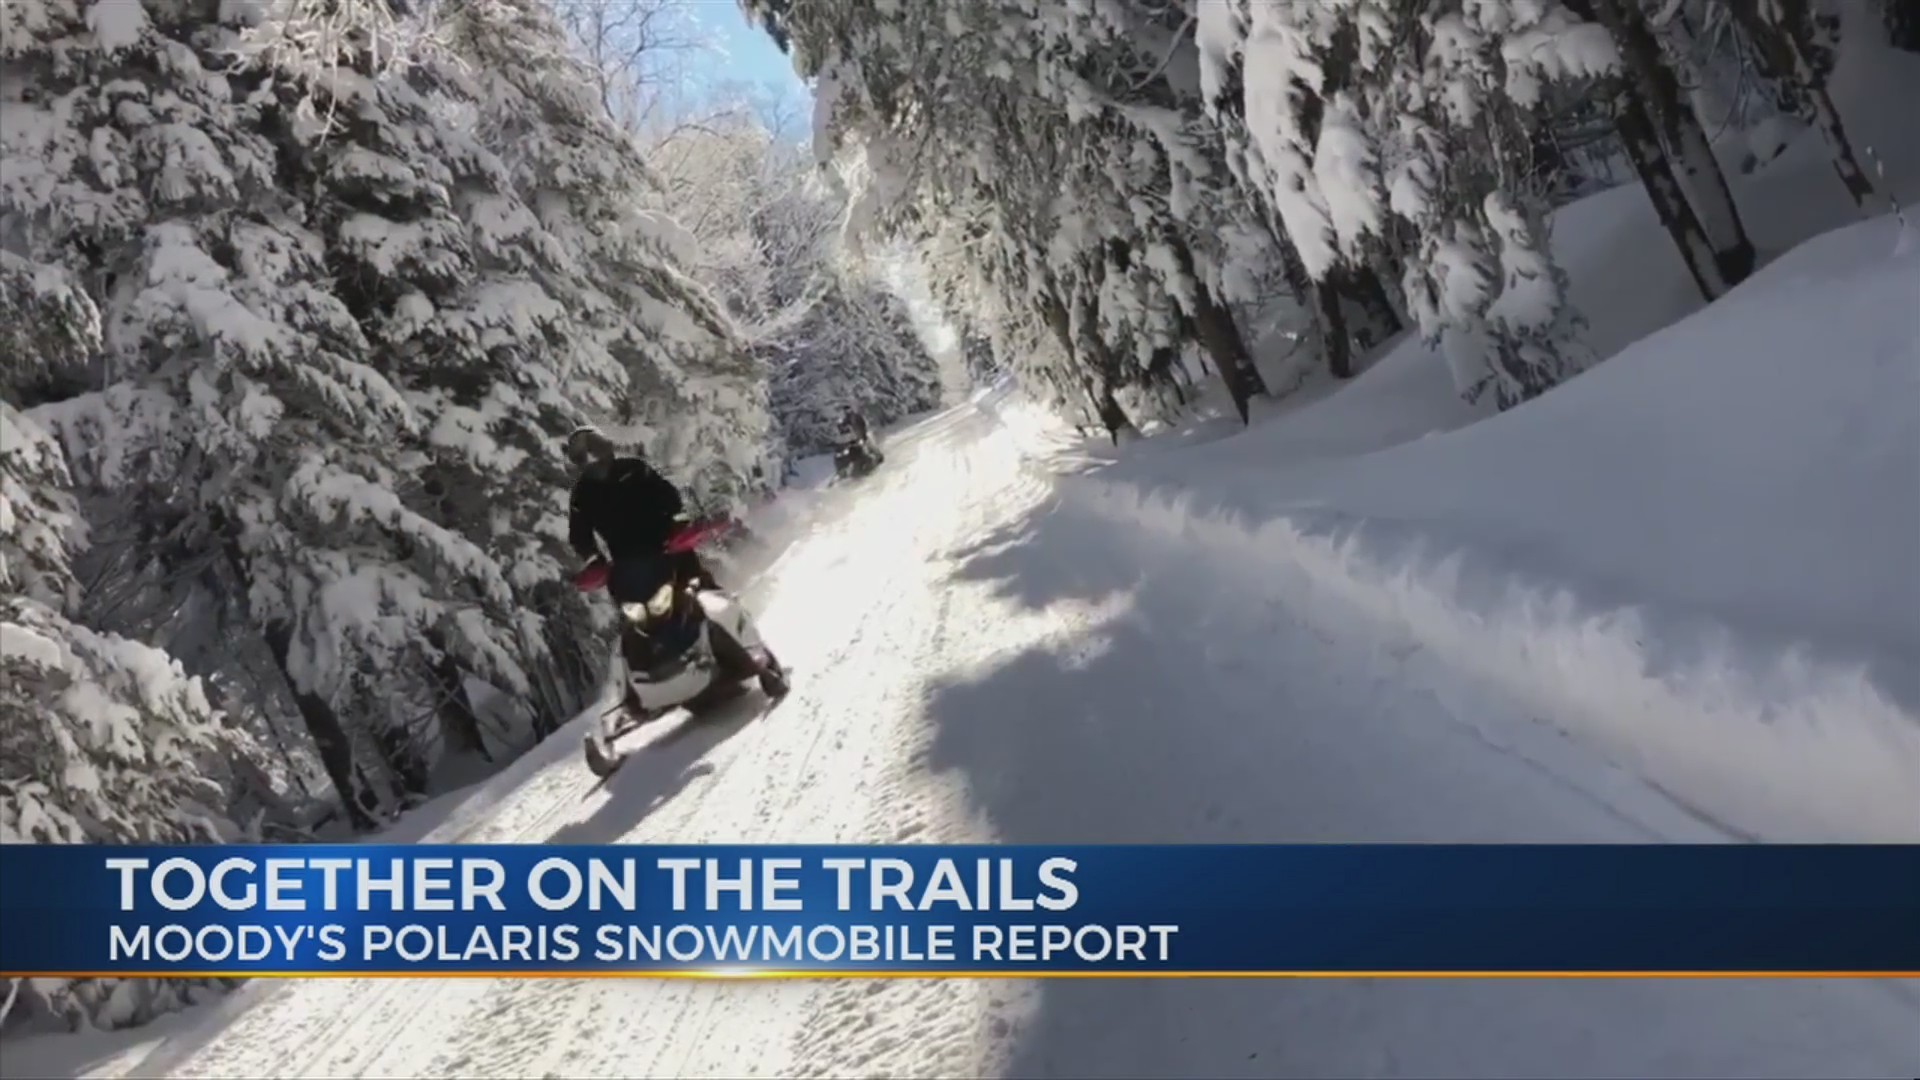 Moody's Polaris Snowmobile Report 1-17